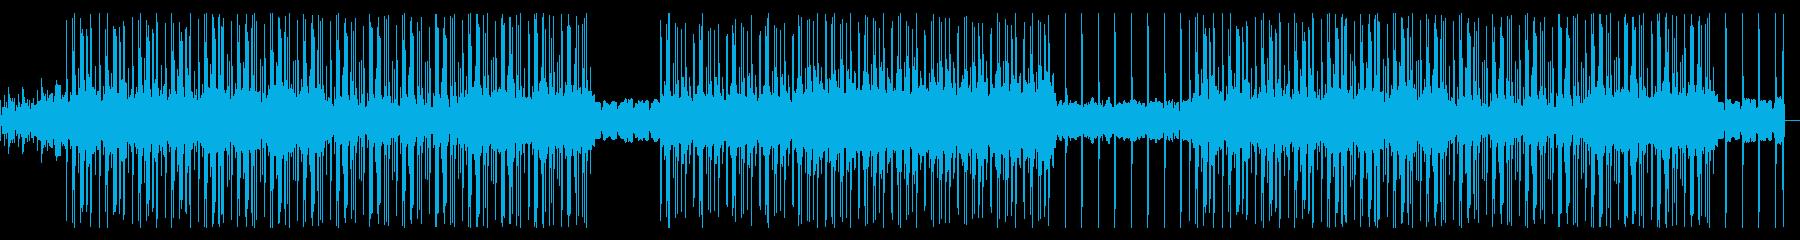 疑問 回想 推理 探索 逆再生音楽の再生済みの波形